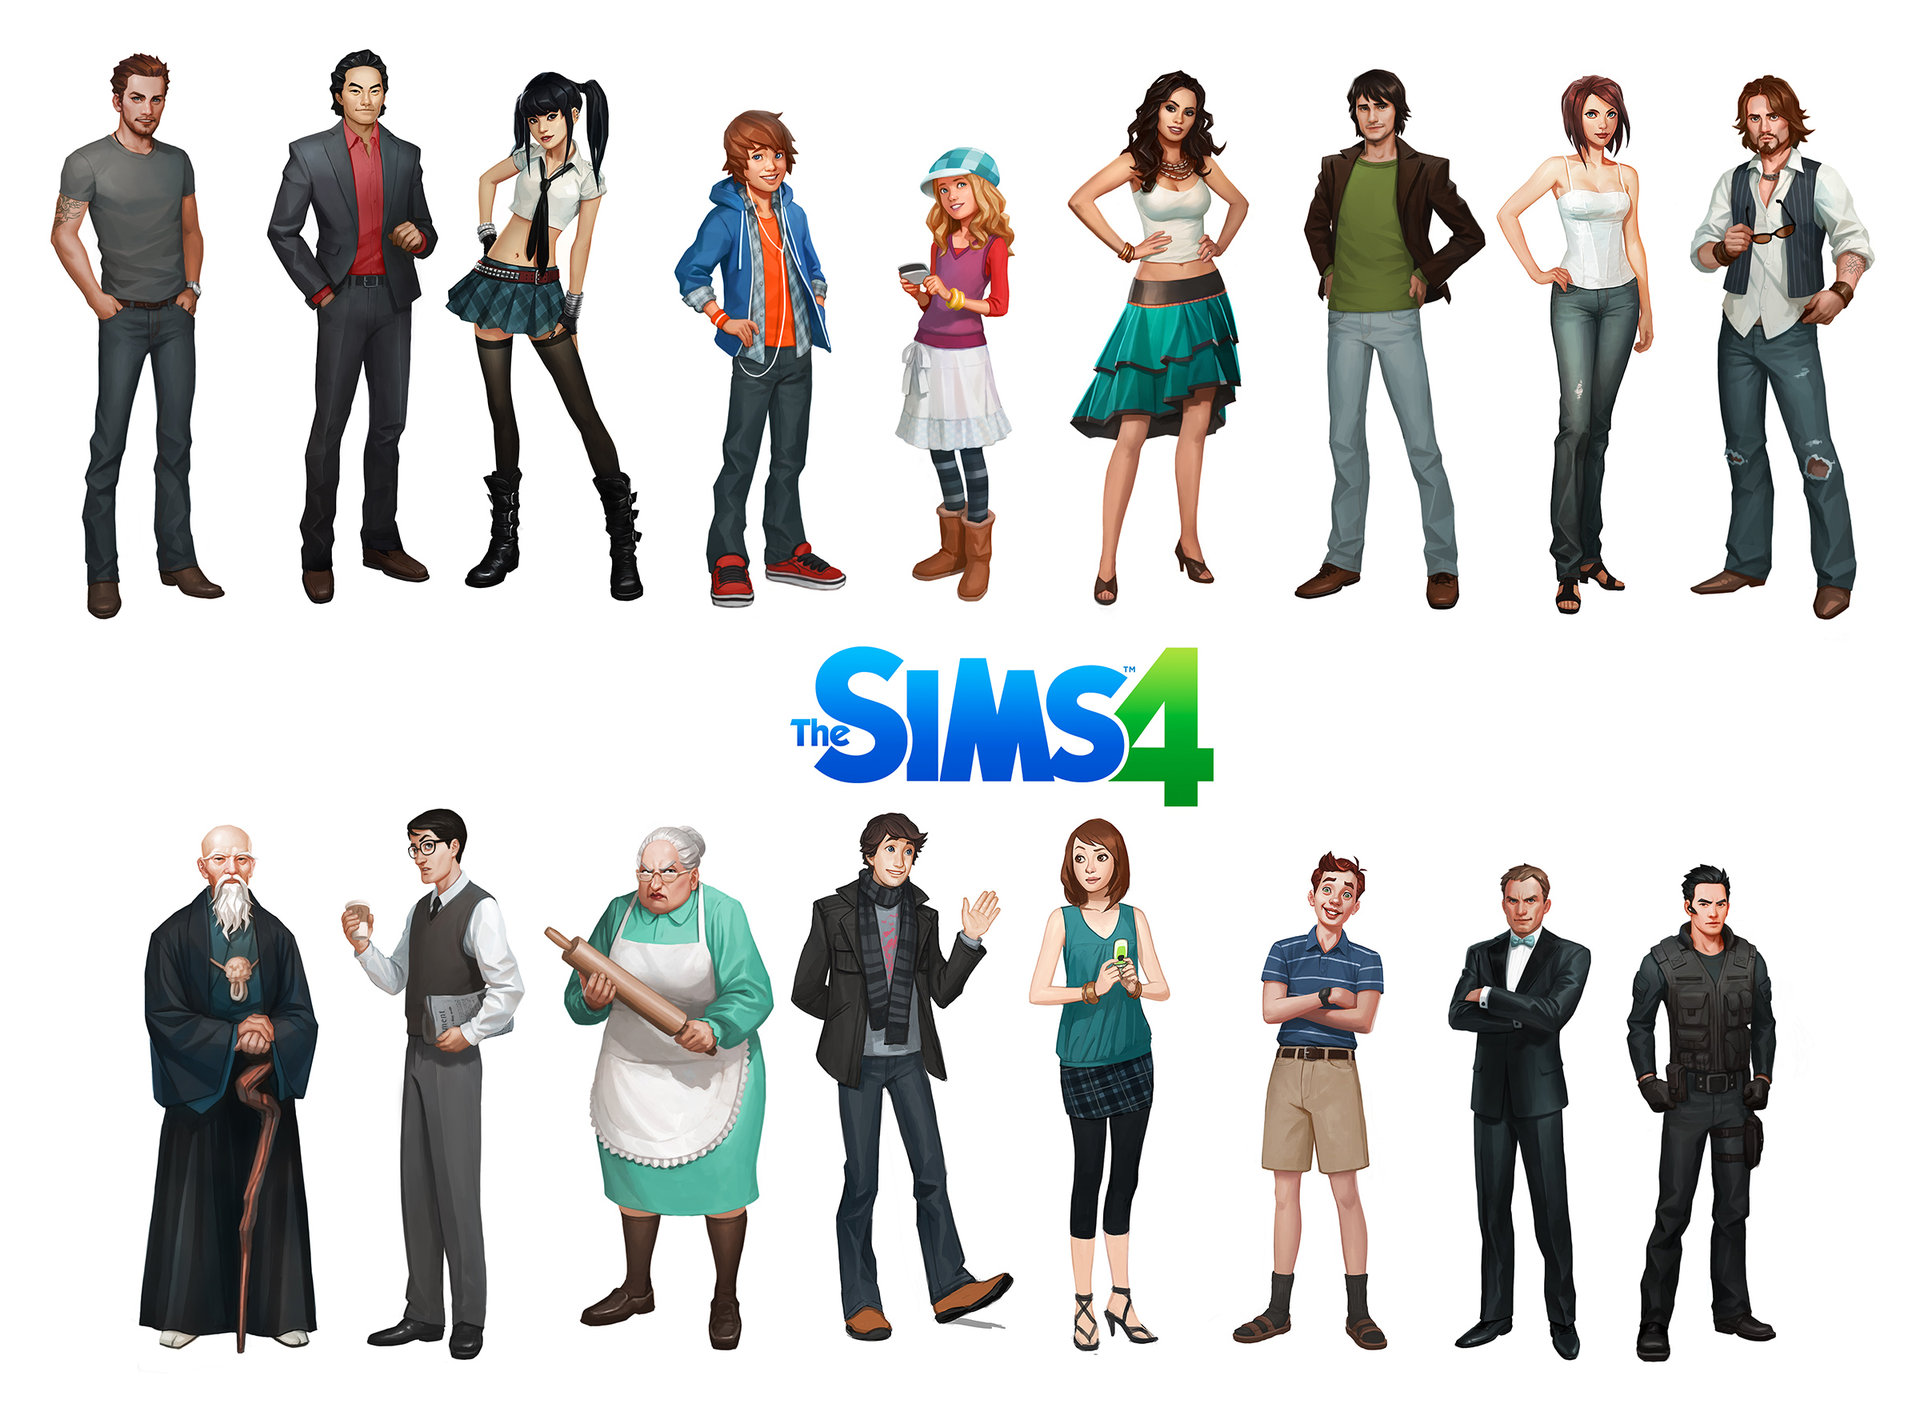 Artstation - Sims 4, Jason Chan-8386